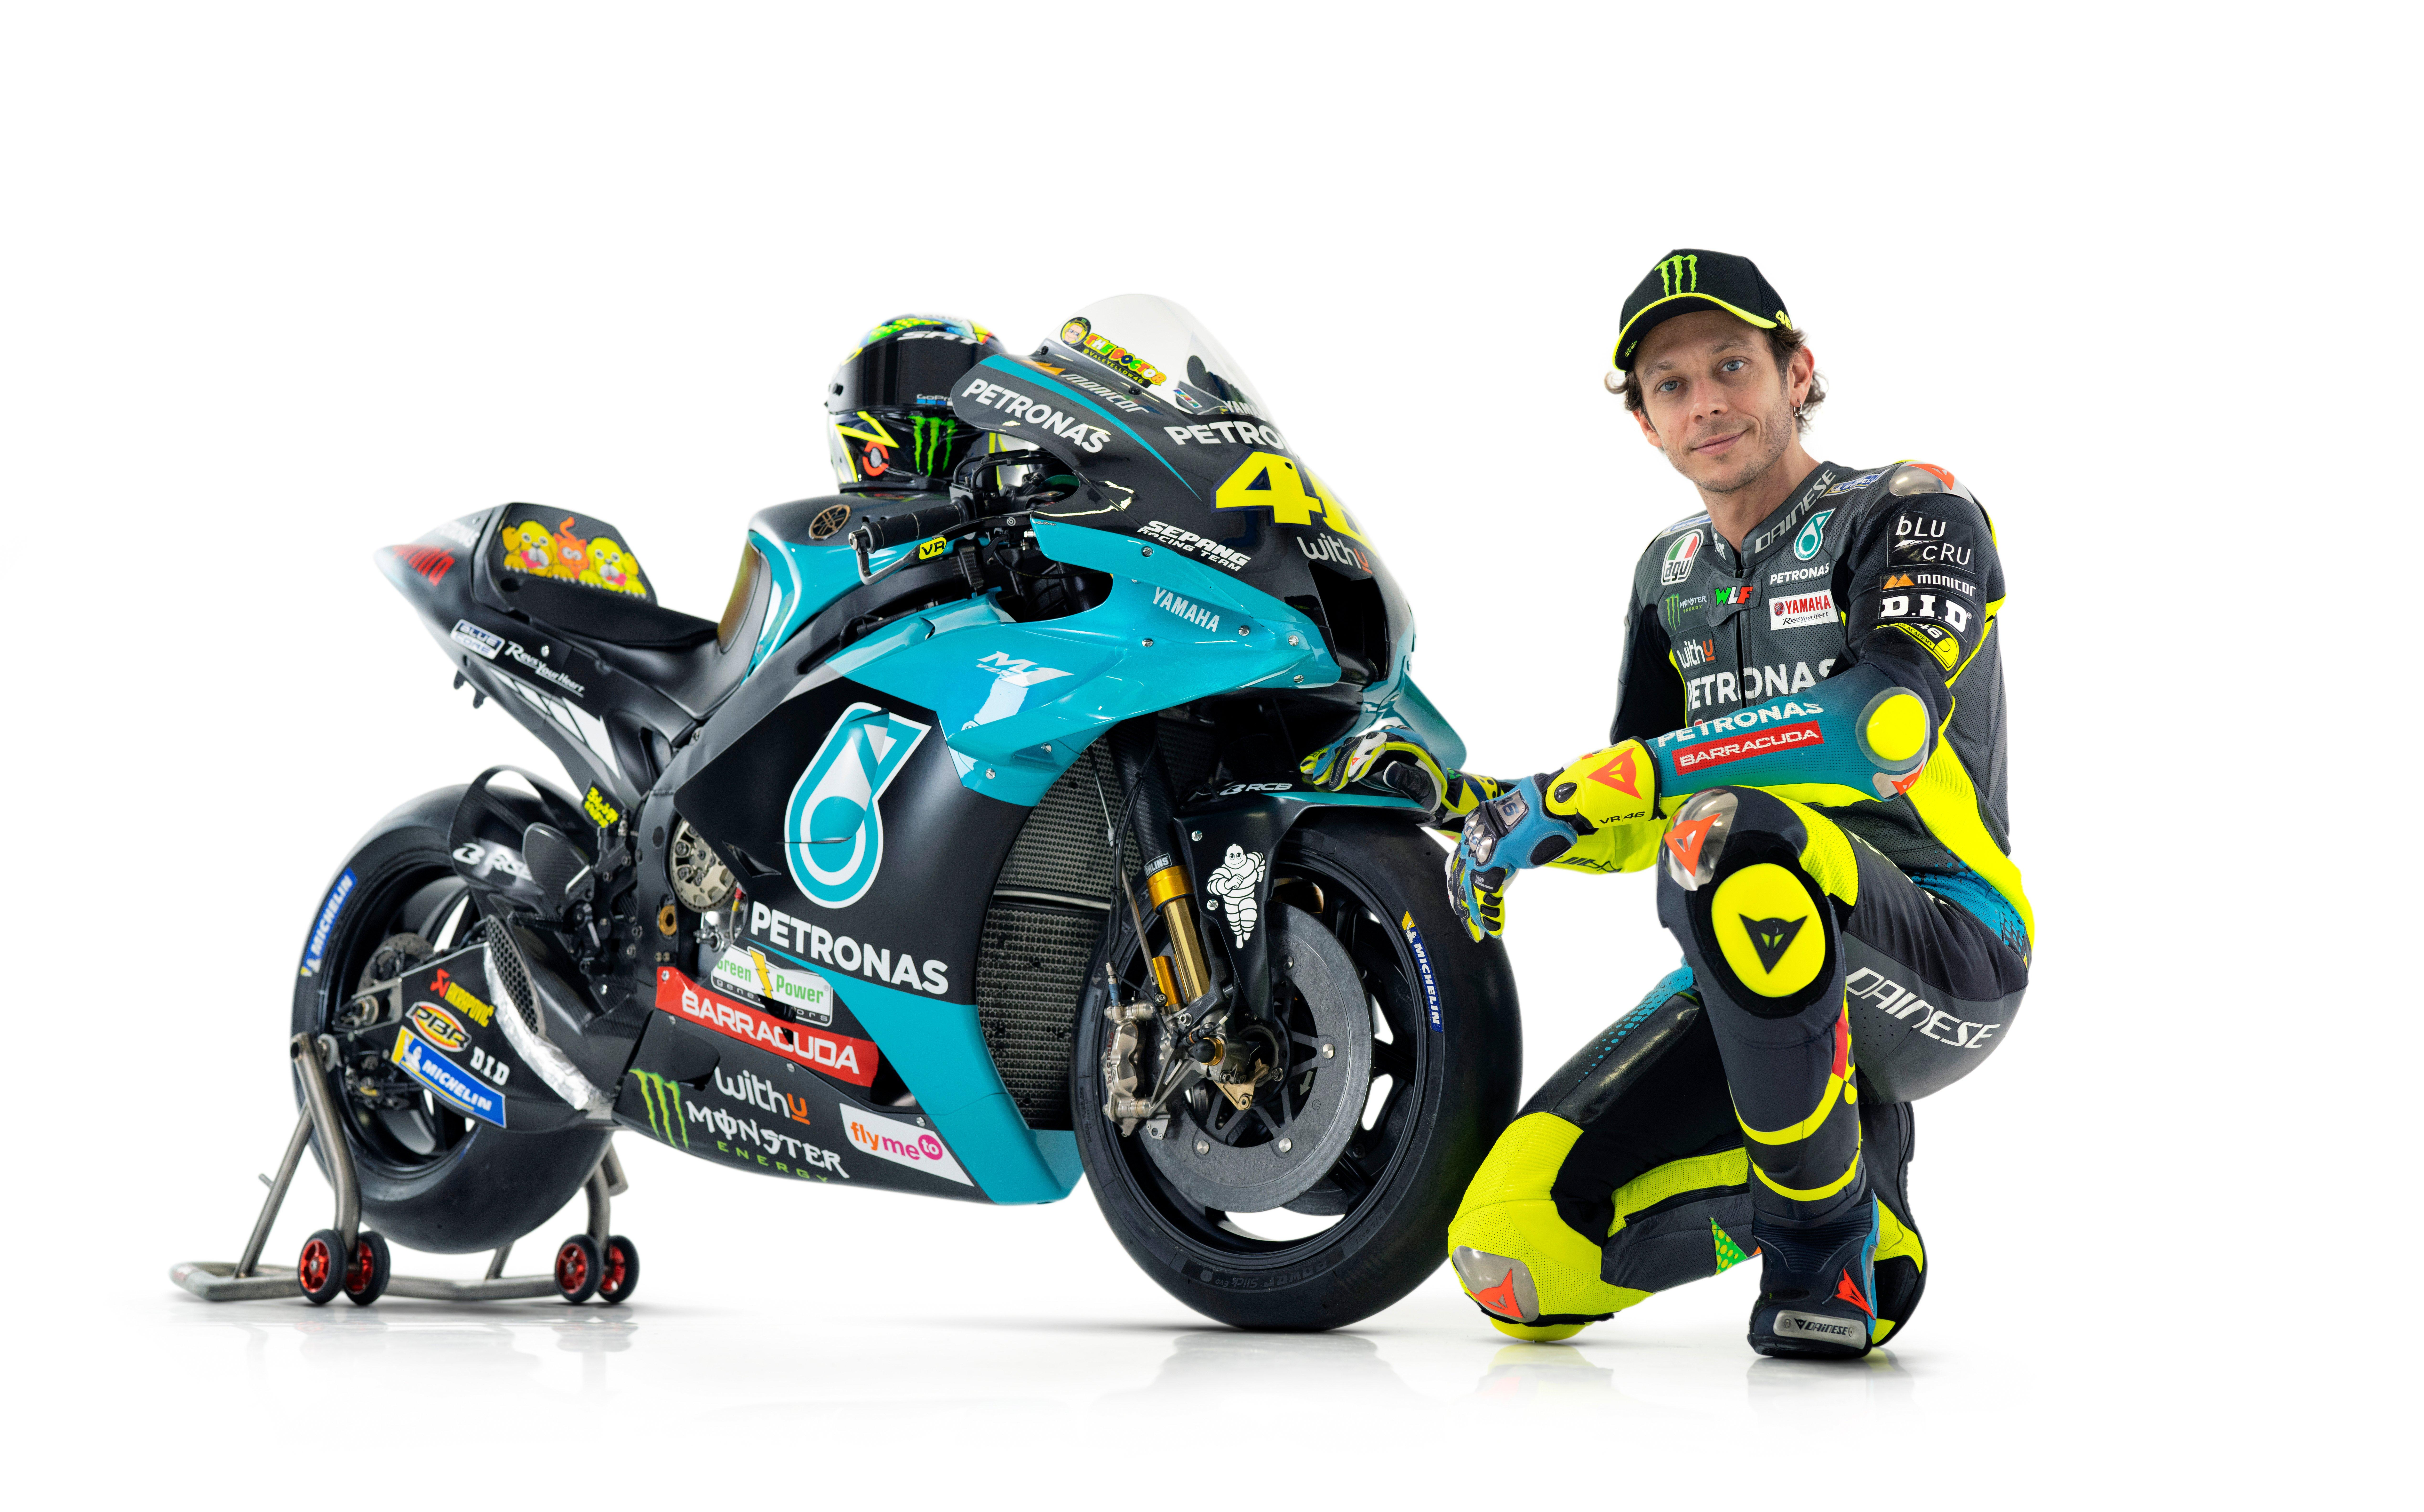 2021 MotoGP: Petronas Sepang Racing unveils racing livery – Valentino Rossi joins team with Morbidelli Image #1255986